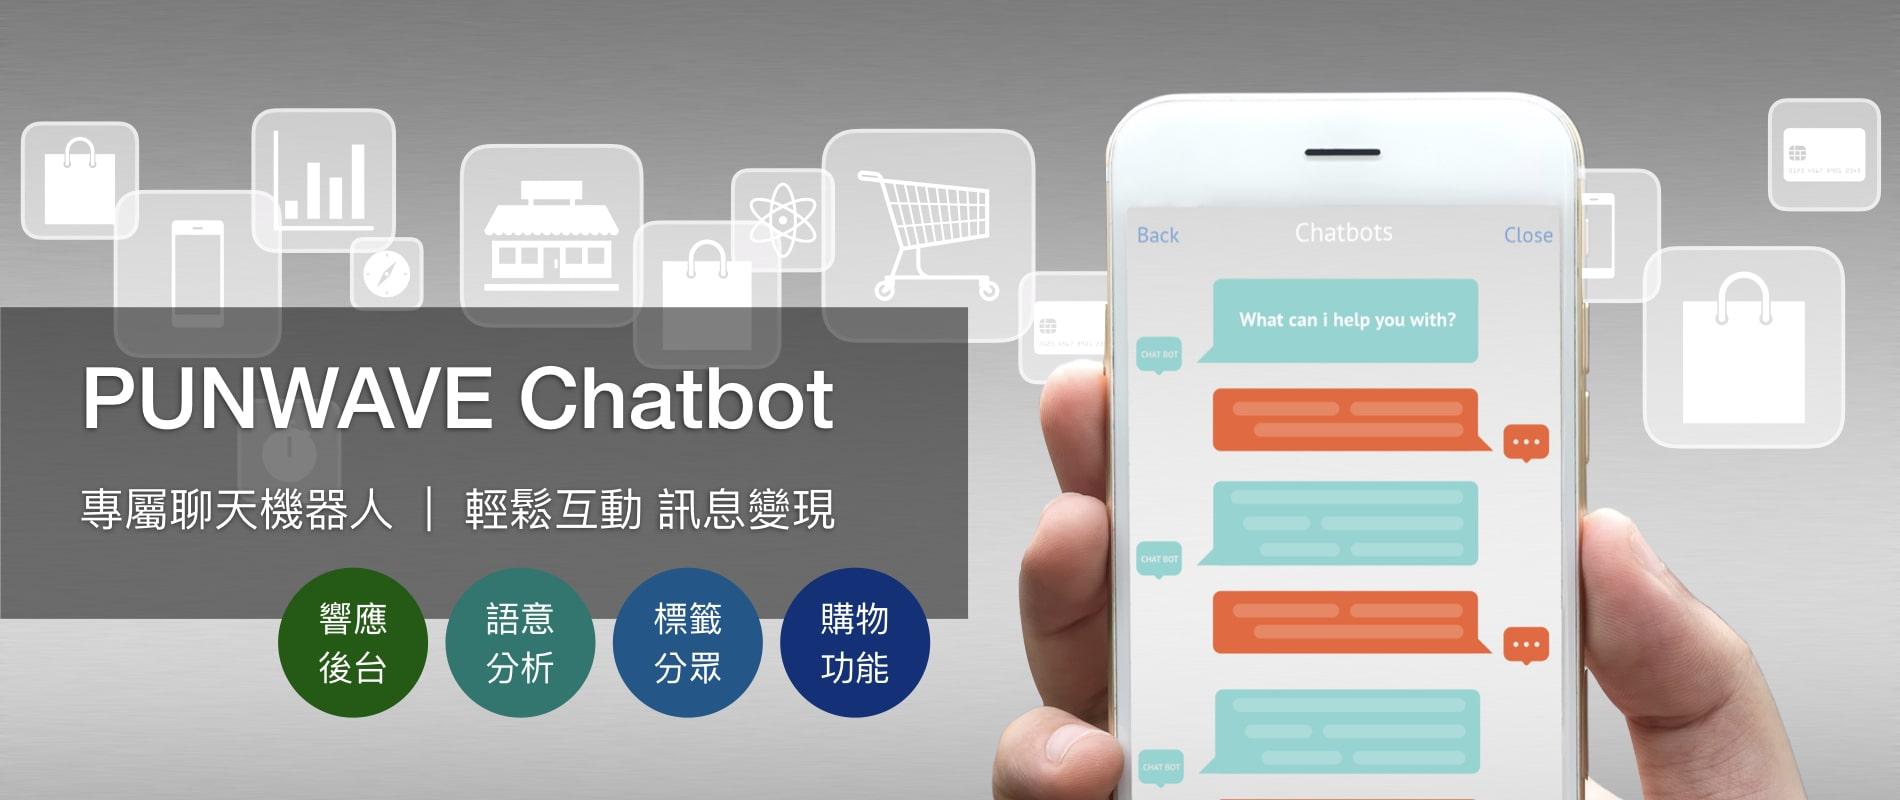 line,facebook,messenger聊天機器人,chatbot,電商,優惠,廣告,行銷